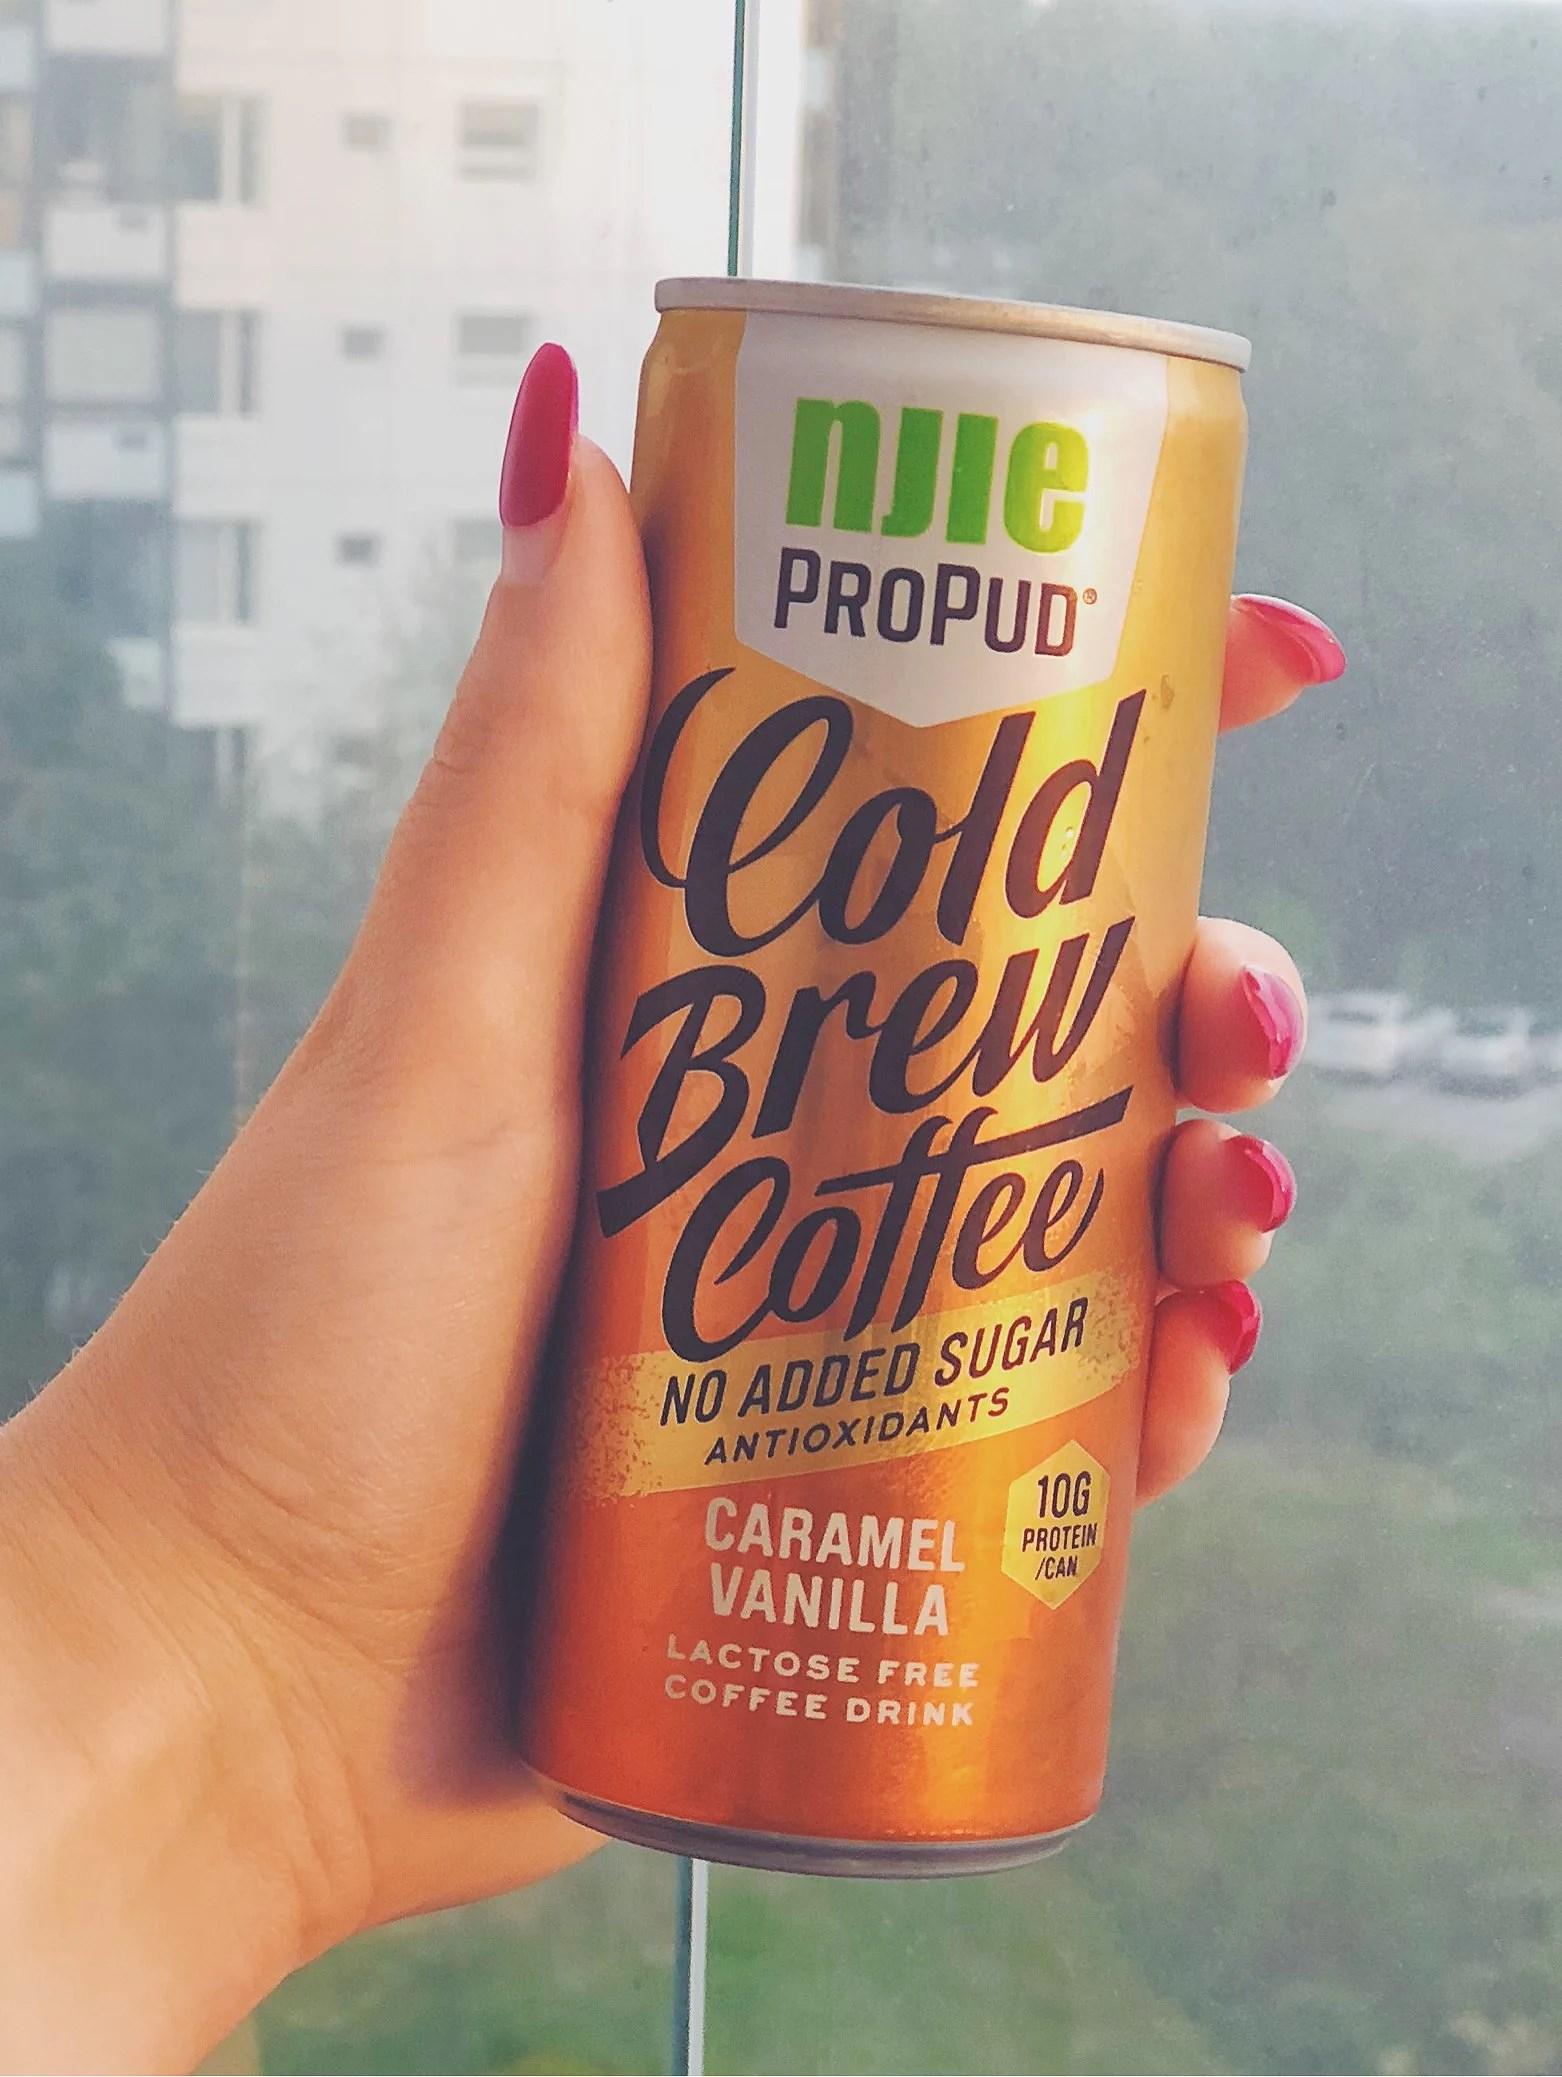 Propud Cold Brew Latte 5/5🌟